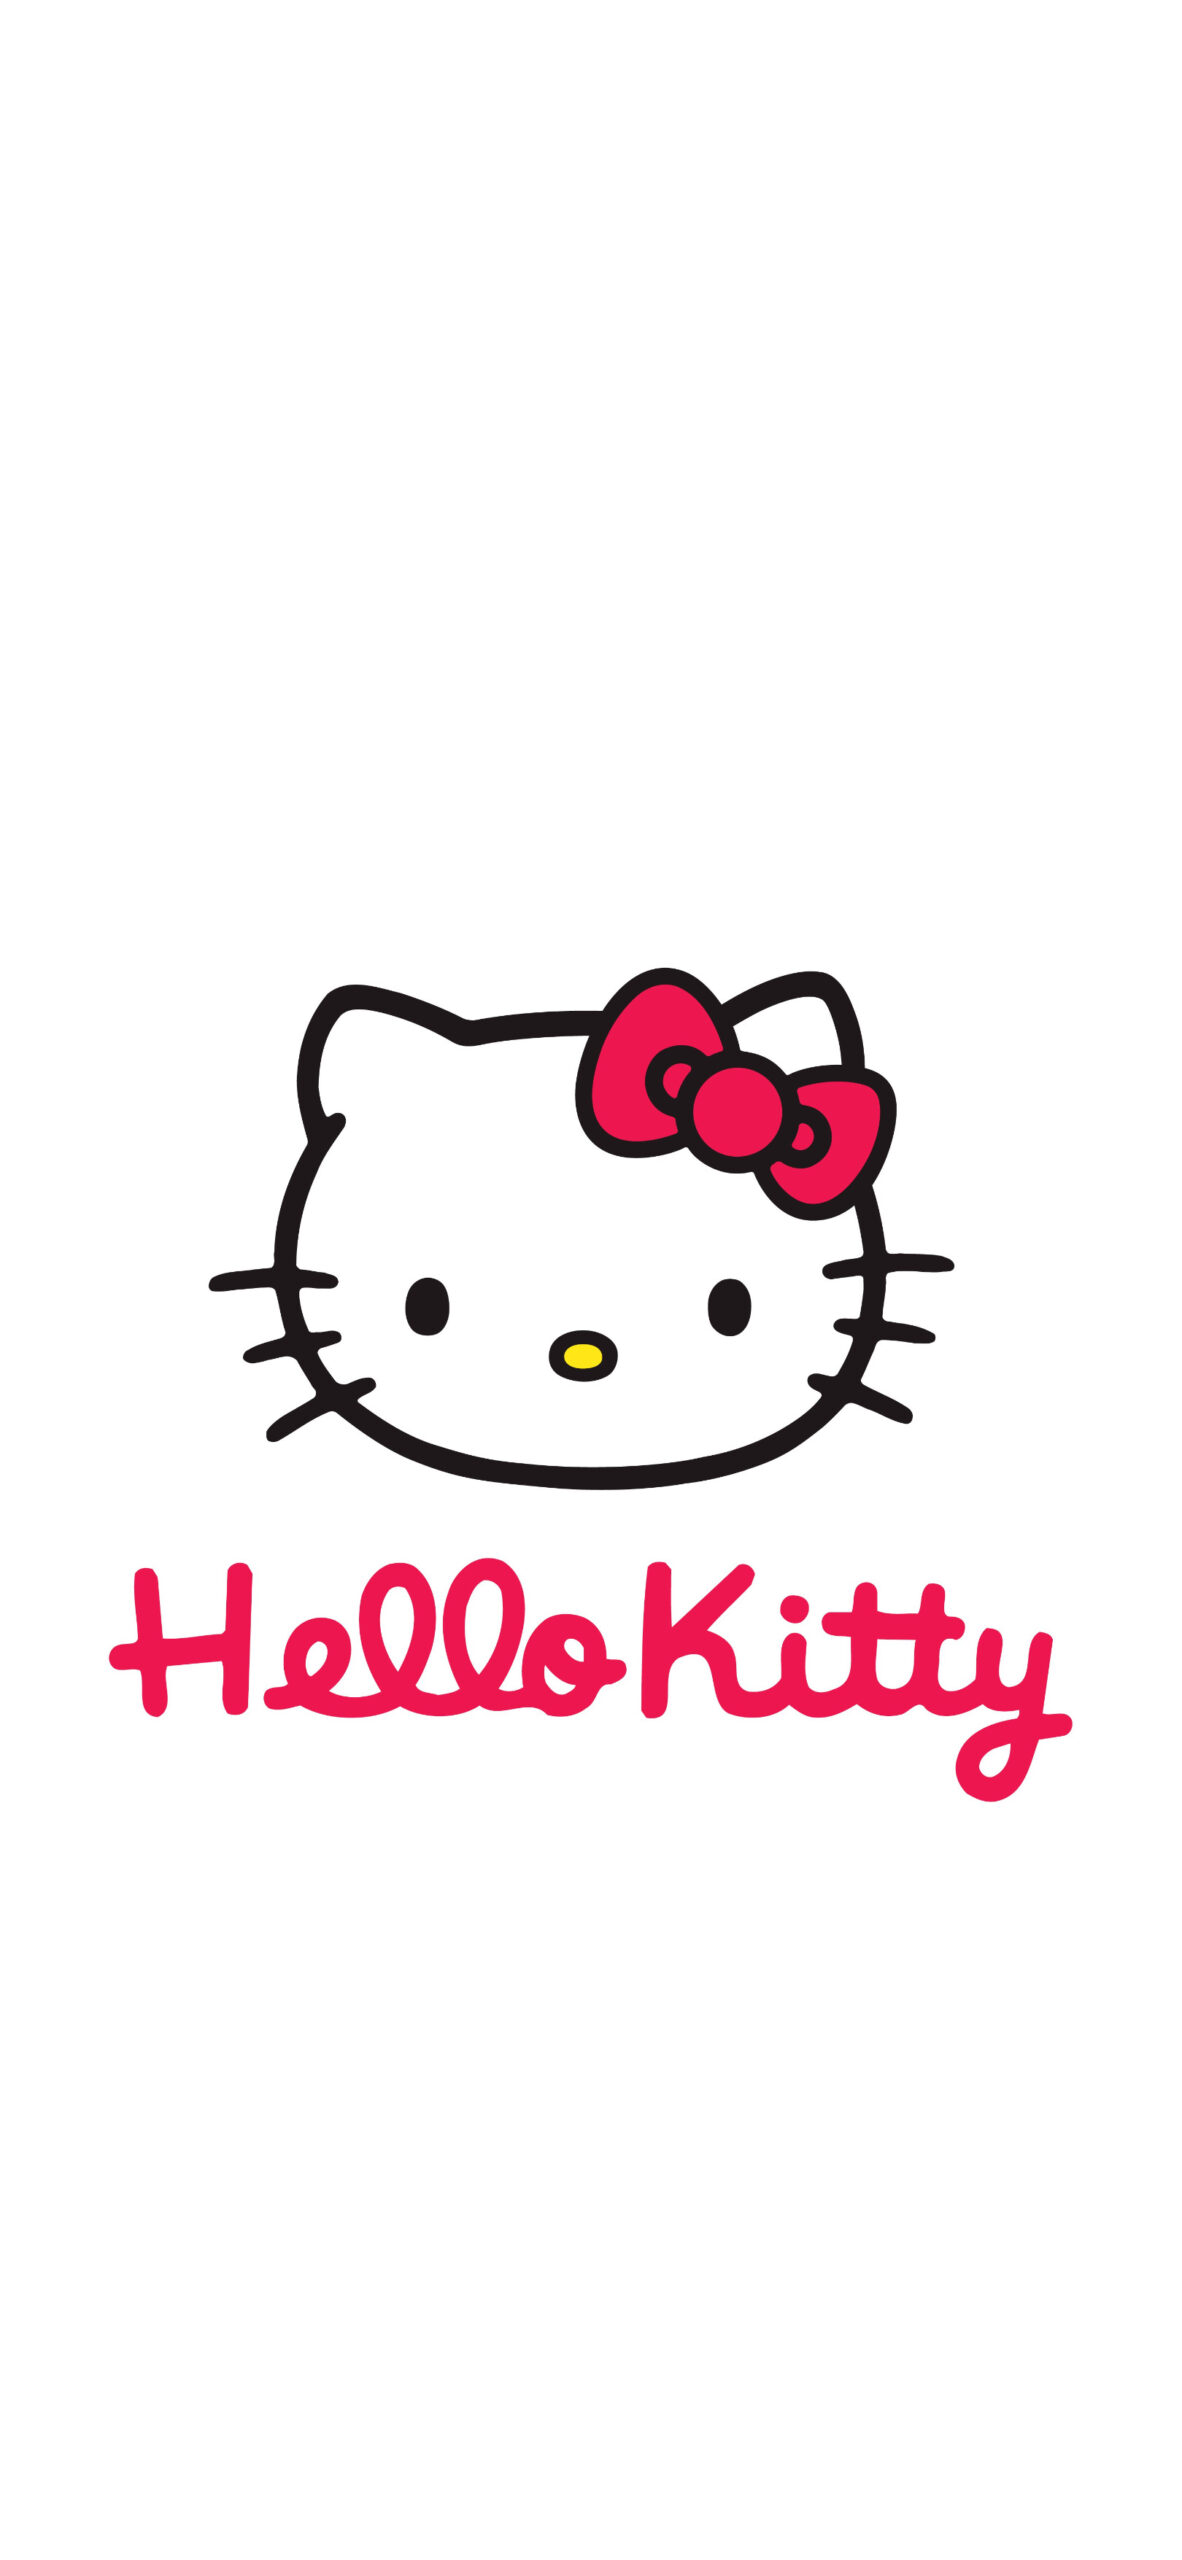 hellokitty09 scaled - ハローキティの無料高画質スマホ壁紙32枚 [iPhone&Androidに対応]